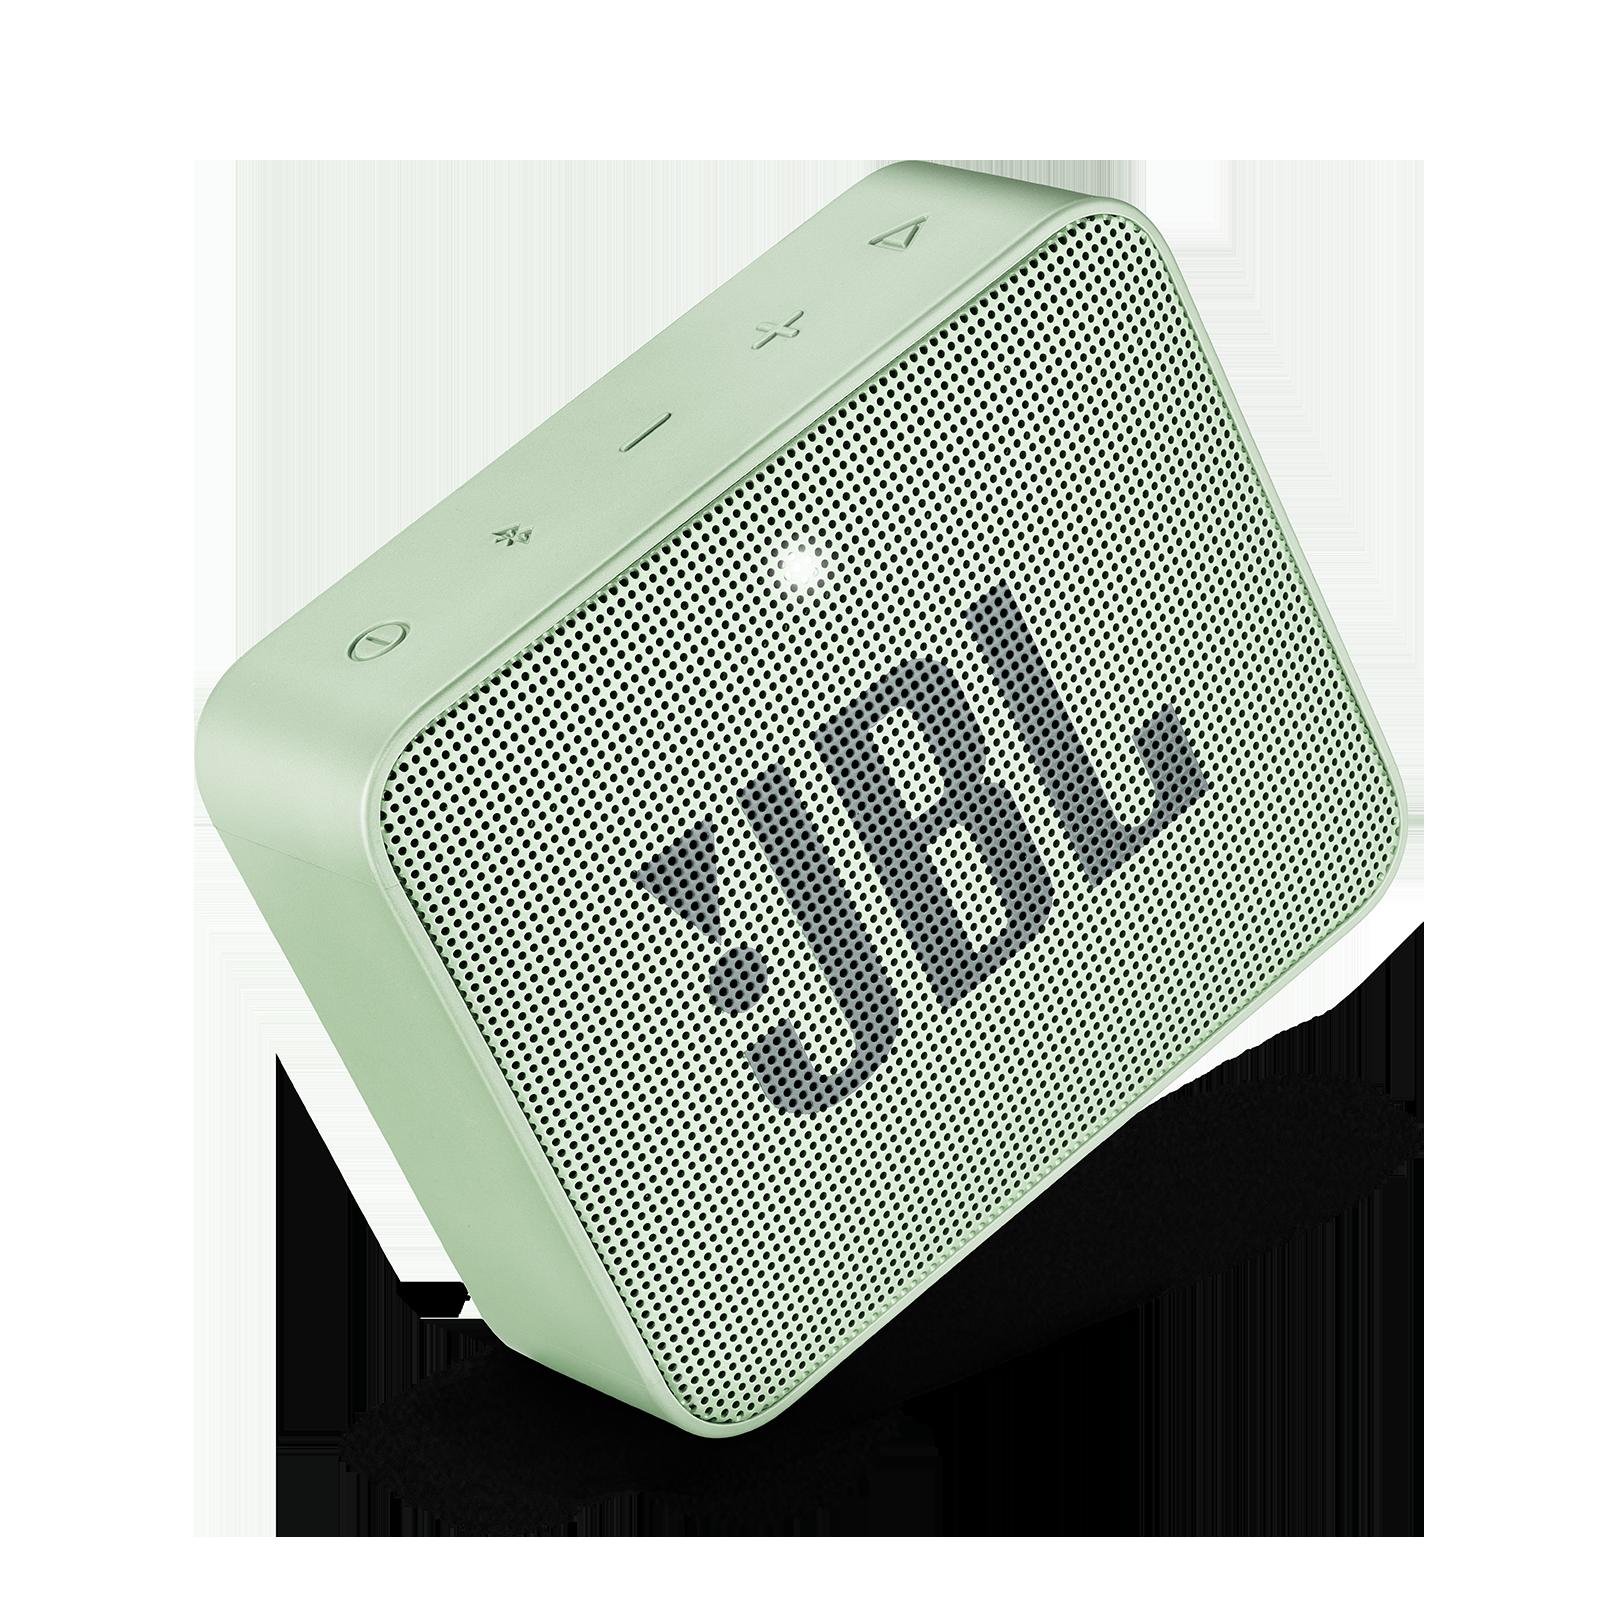 JBL GO 2 - Seafoam Mint - Portable Bluetooth speaker - Detailshot 1